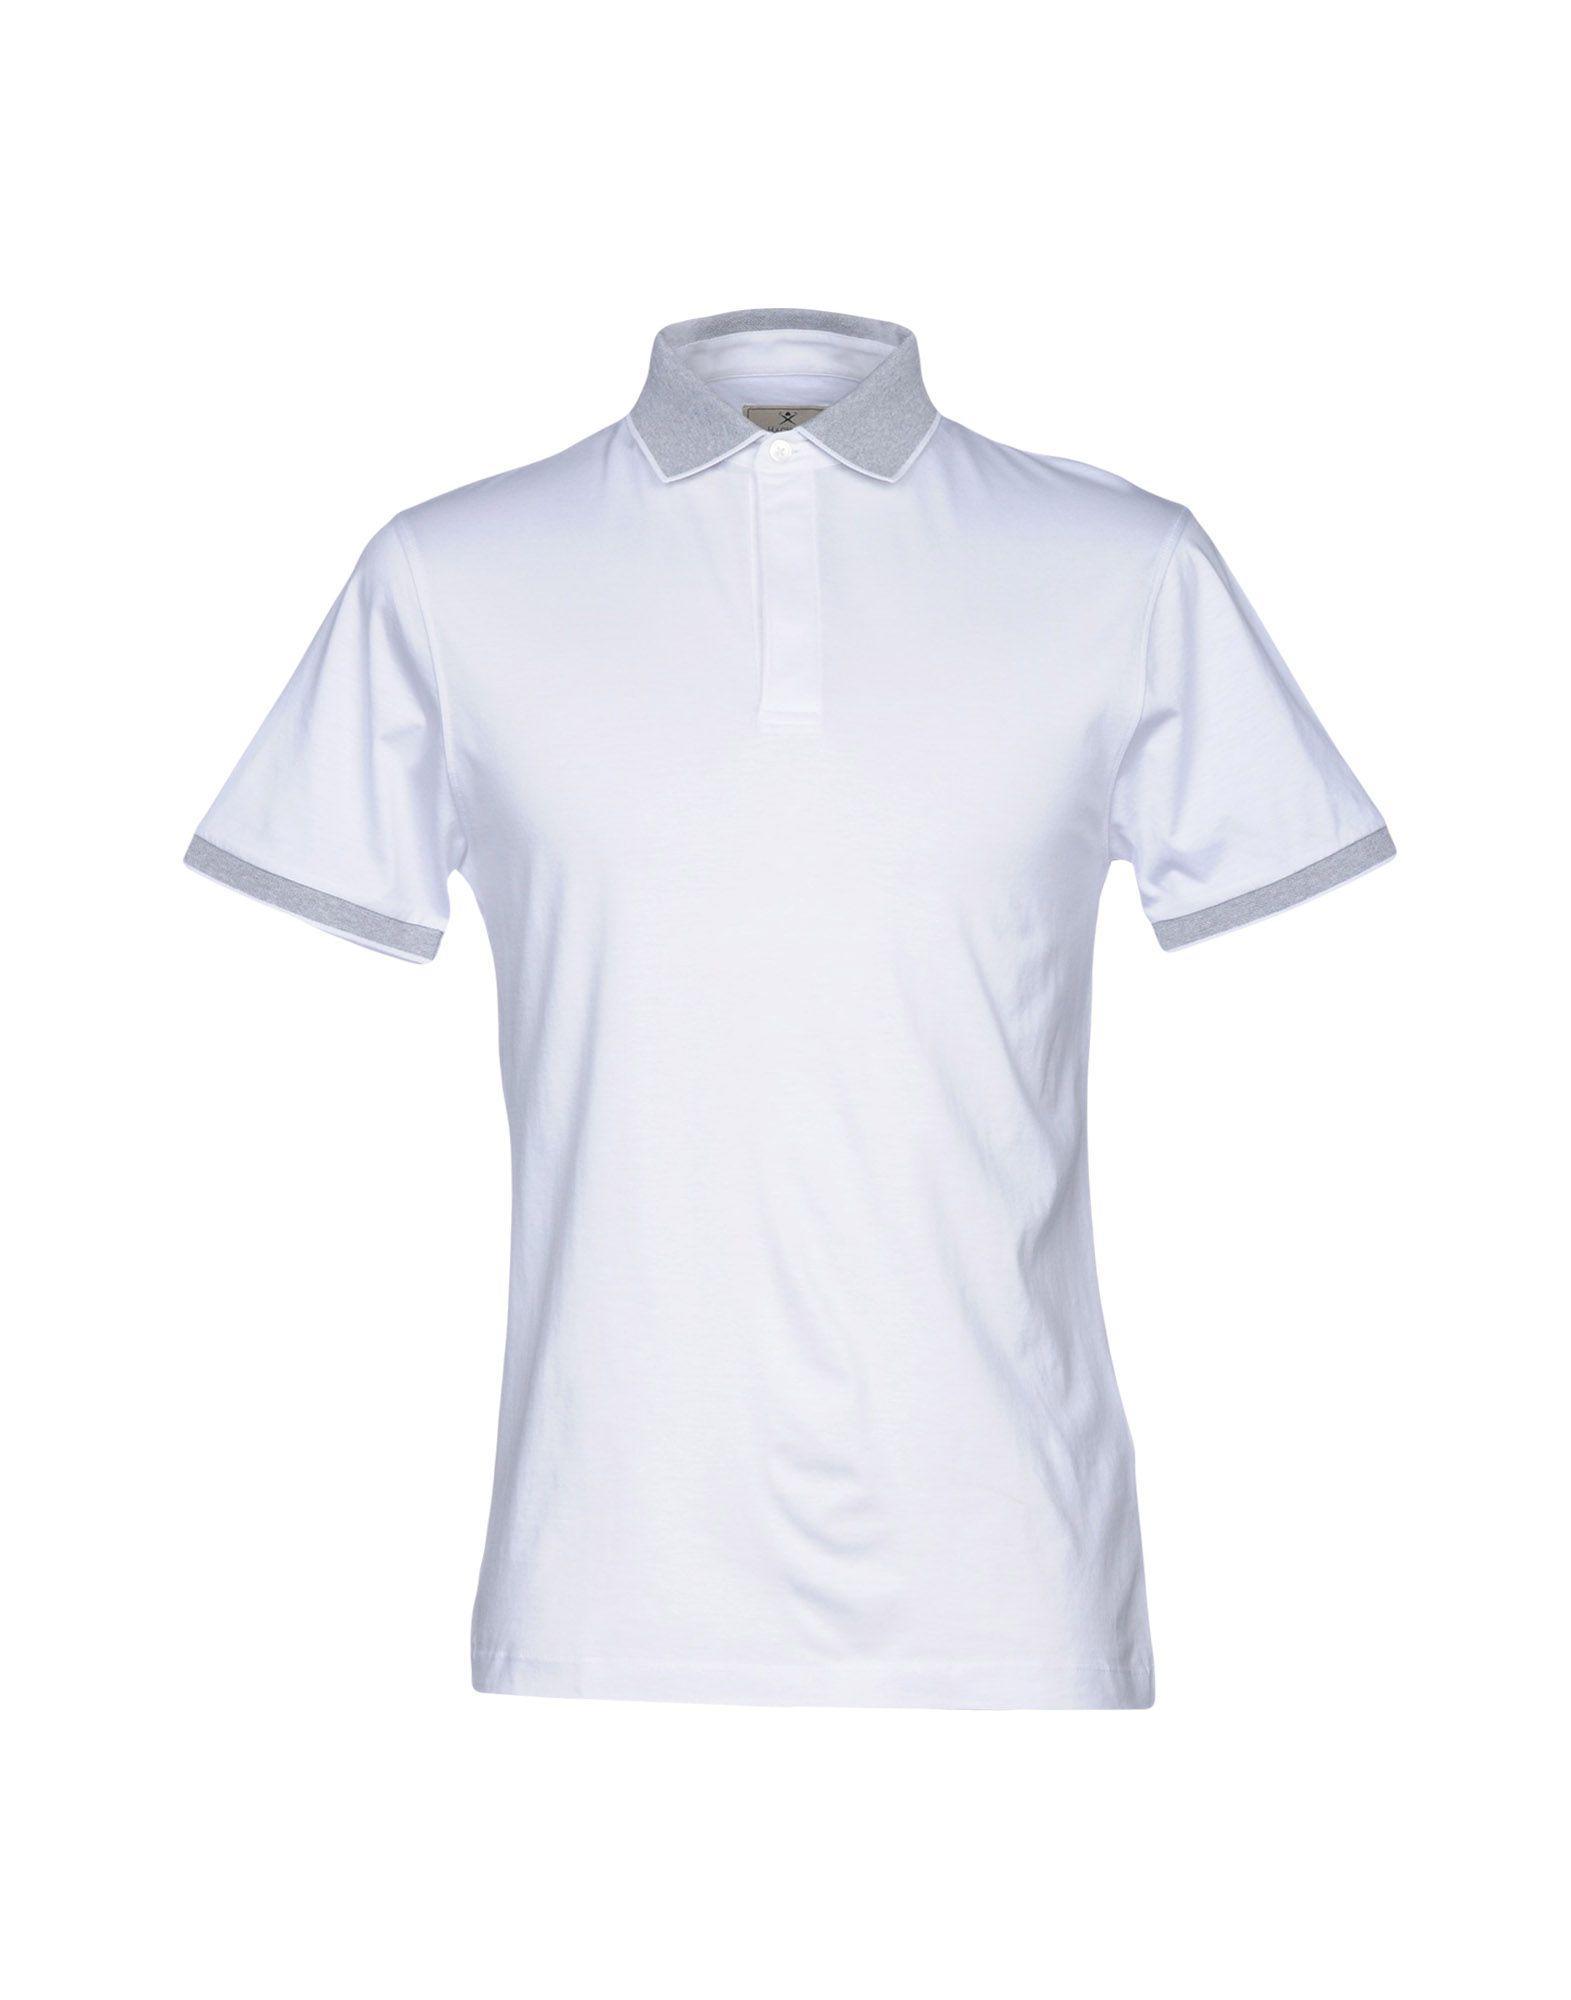 Hackett Polo Shirt In White